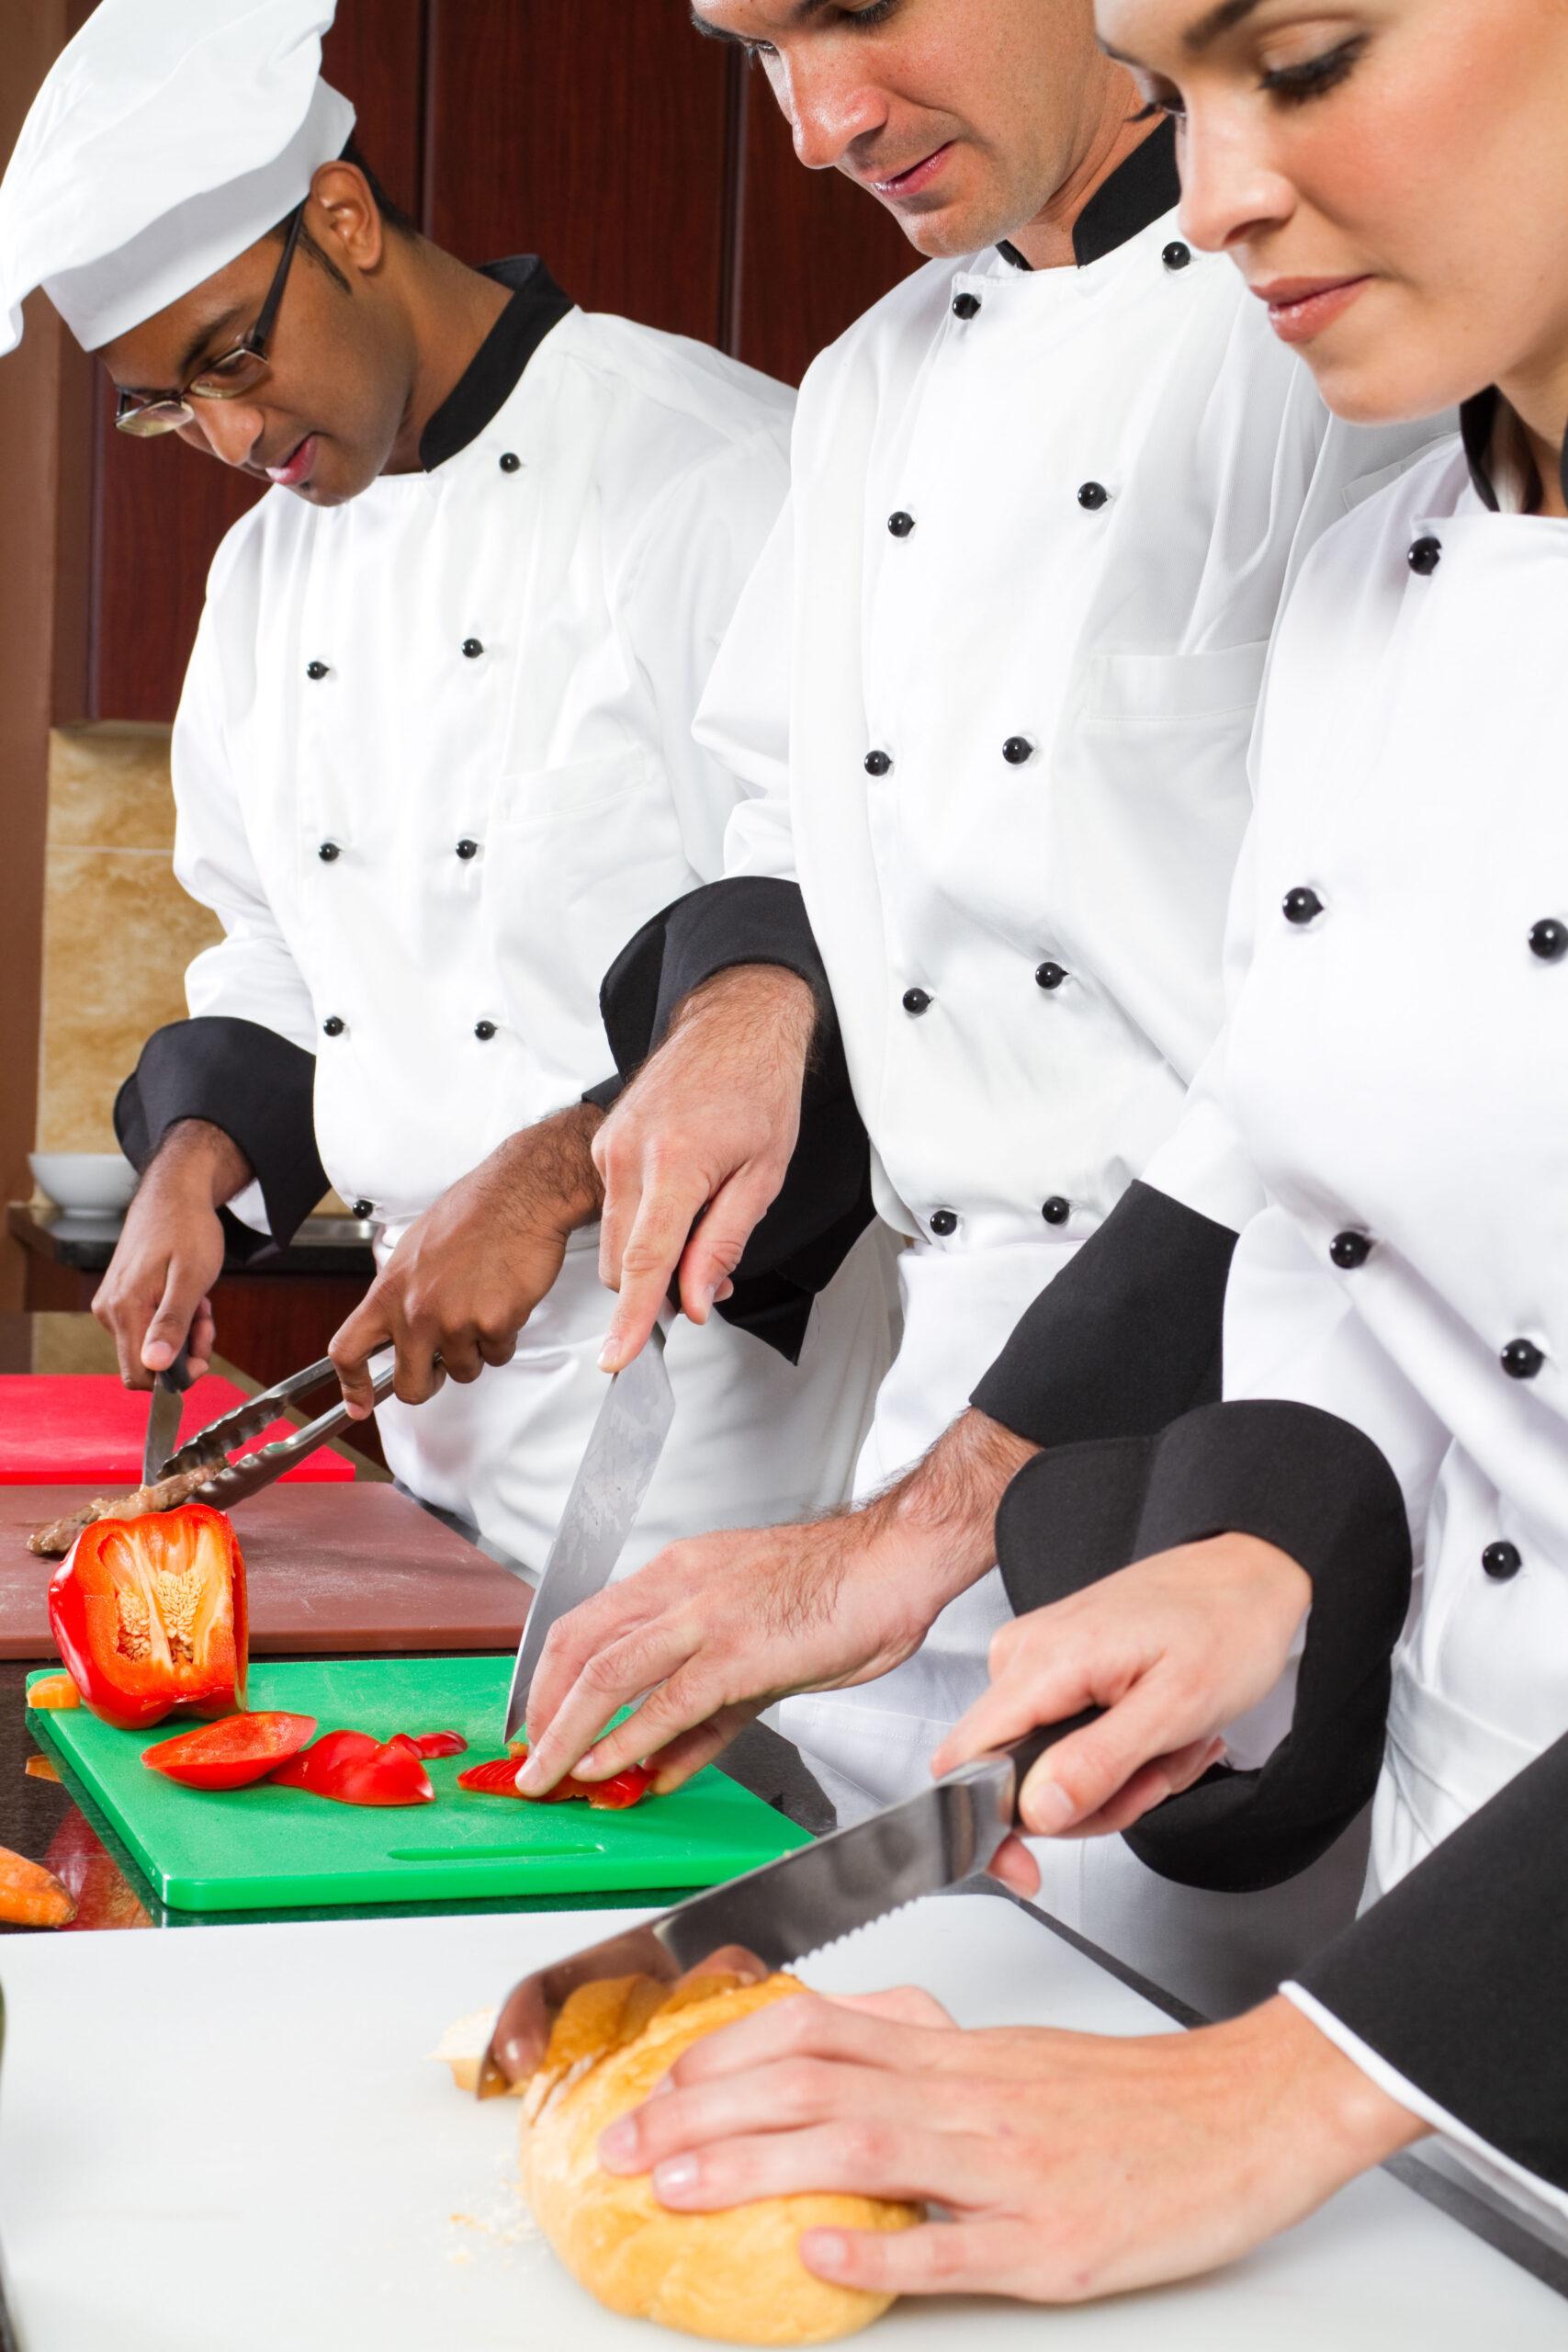 Professional cooks teamwork